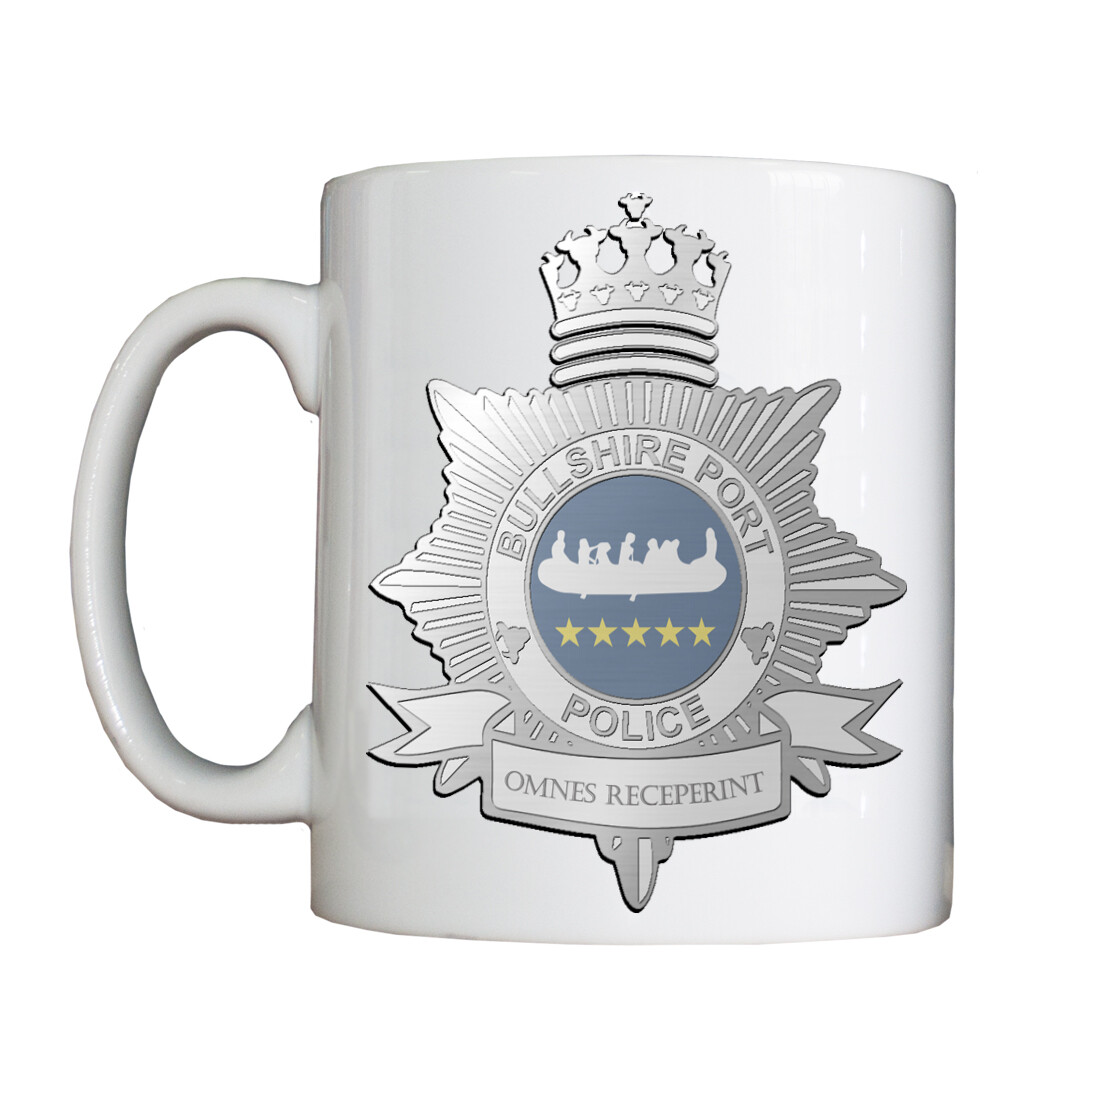 Personalised 'Bullshire Port Police' Drinking Vessel